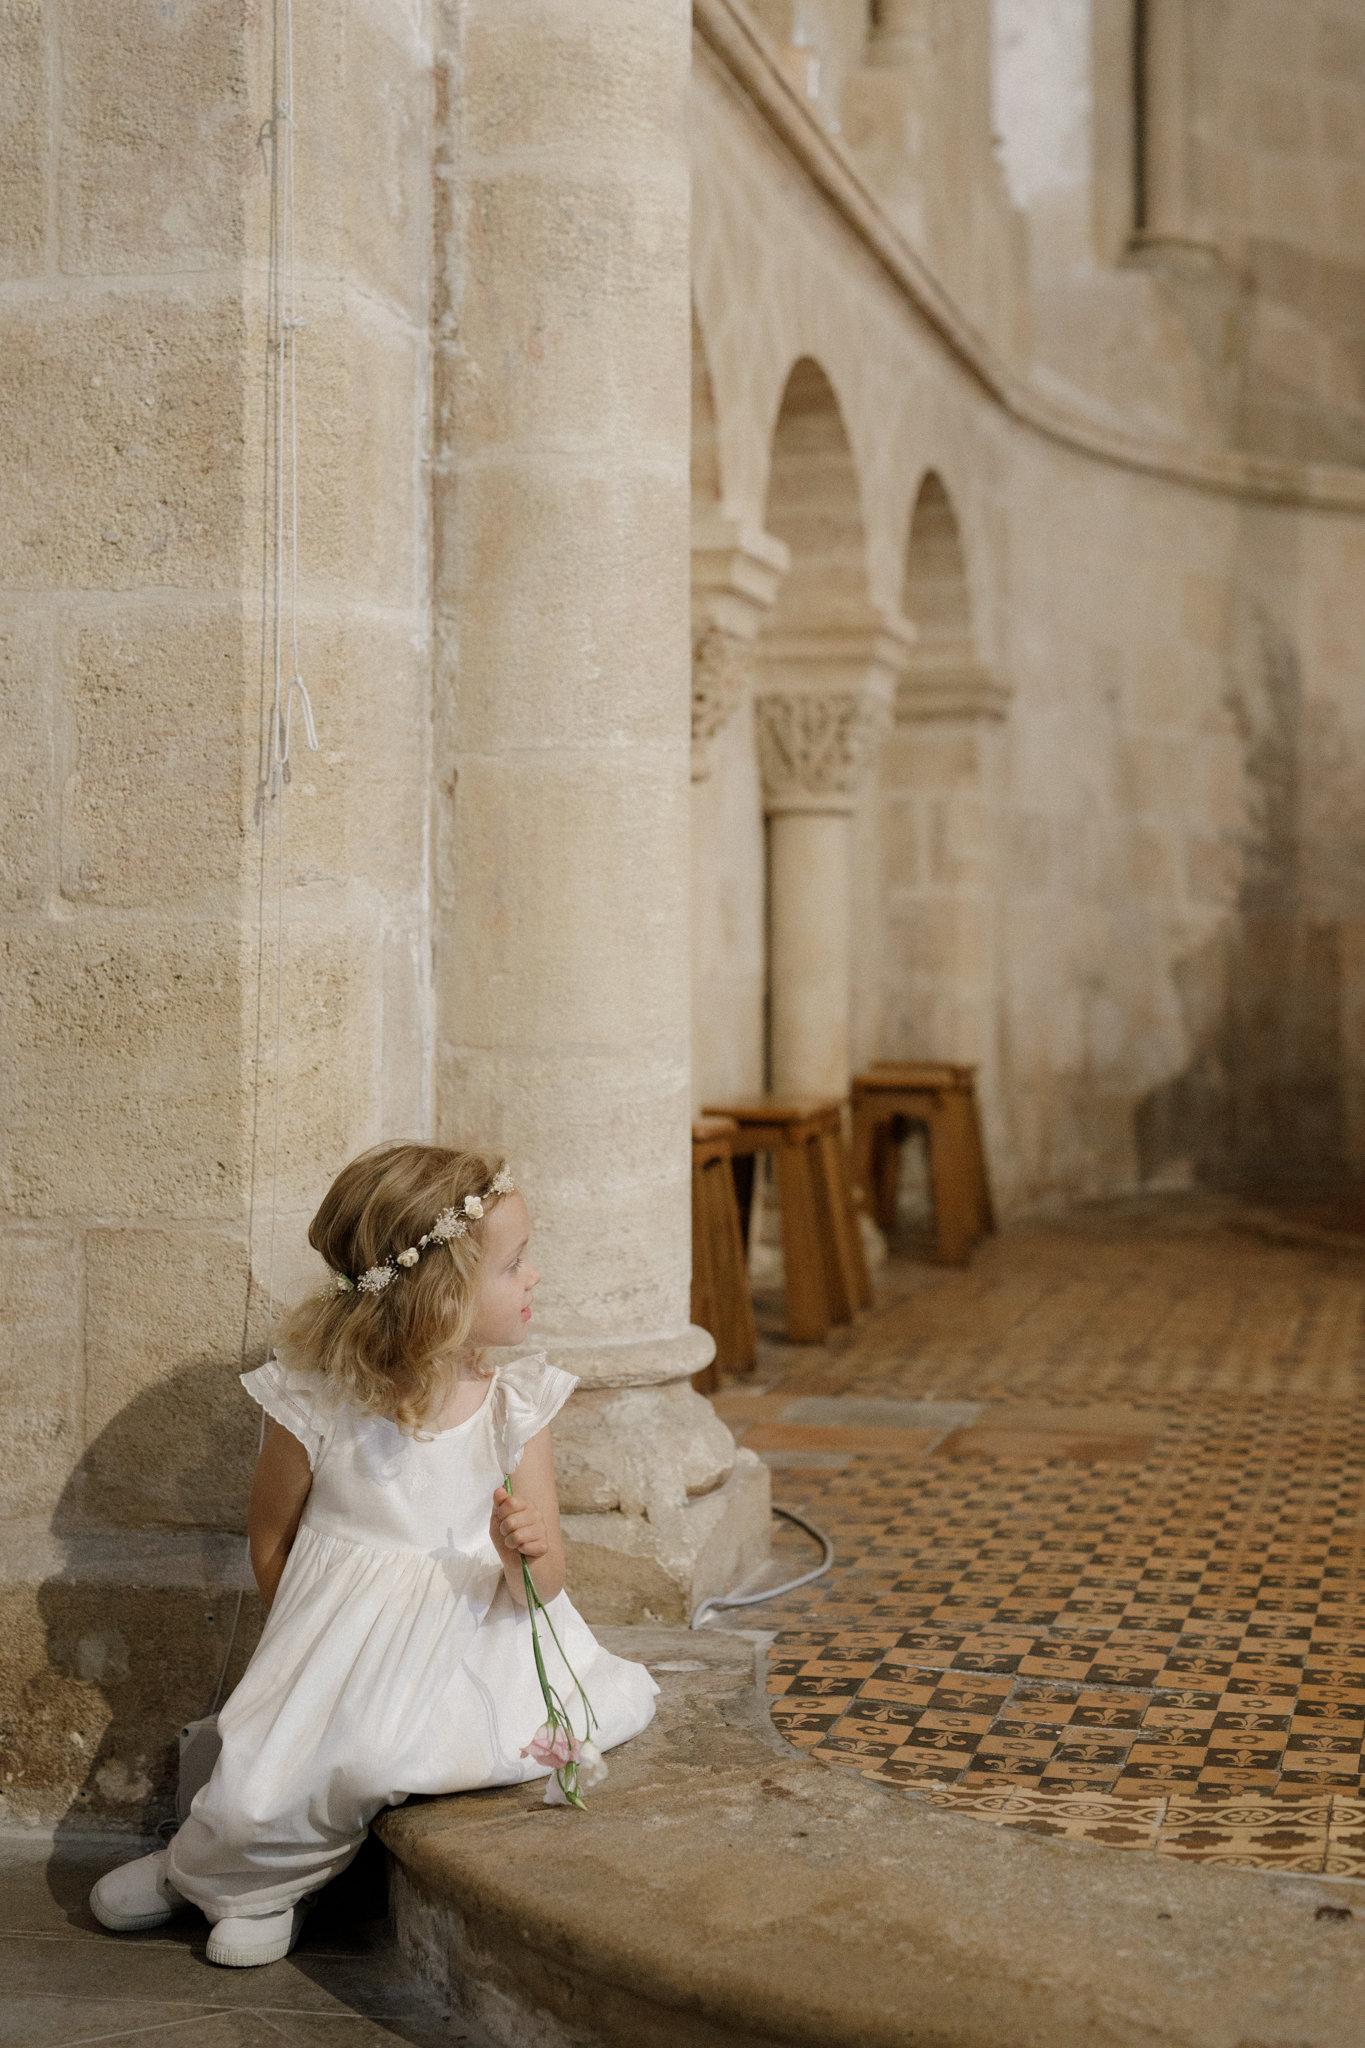 French children's brand Cyrillus flower girl dress